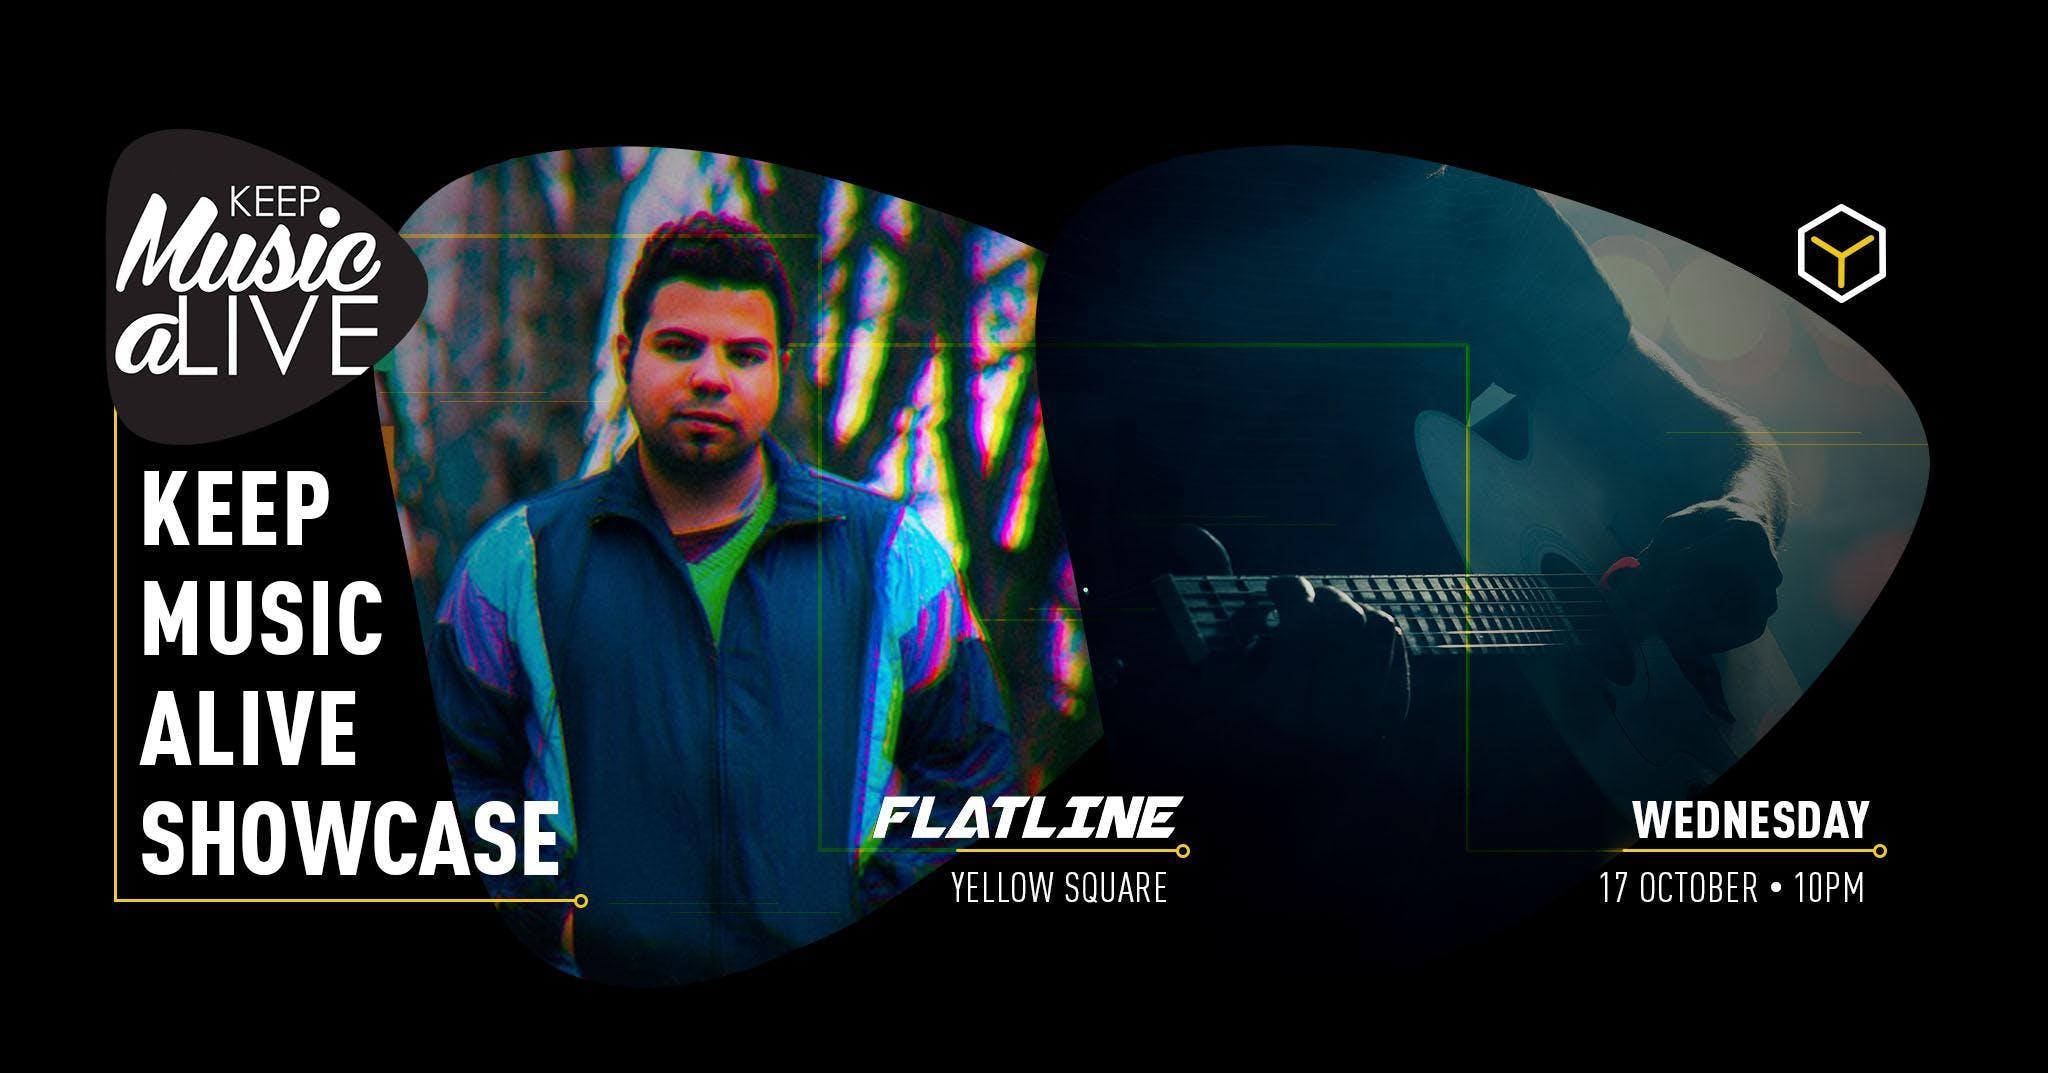 Keep Music Alive Showcase: Flatline - The Yellow Bar